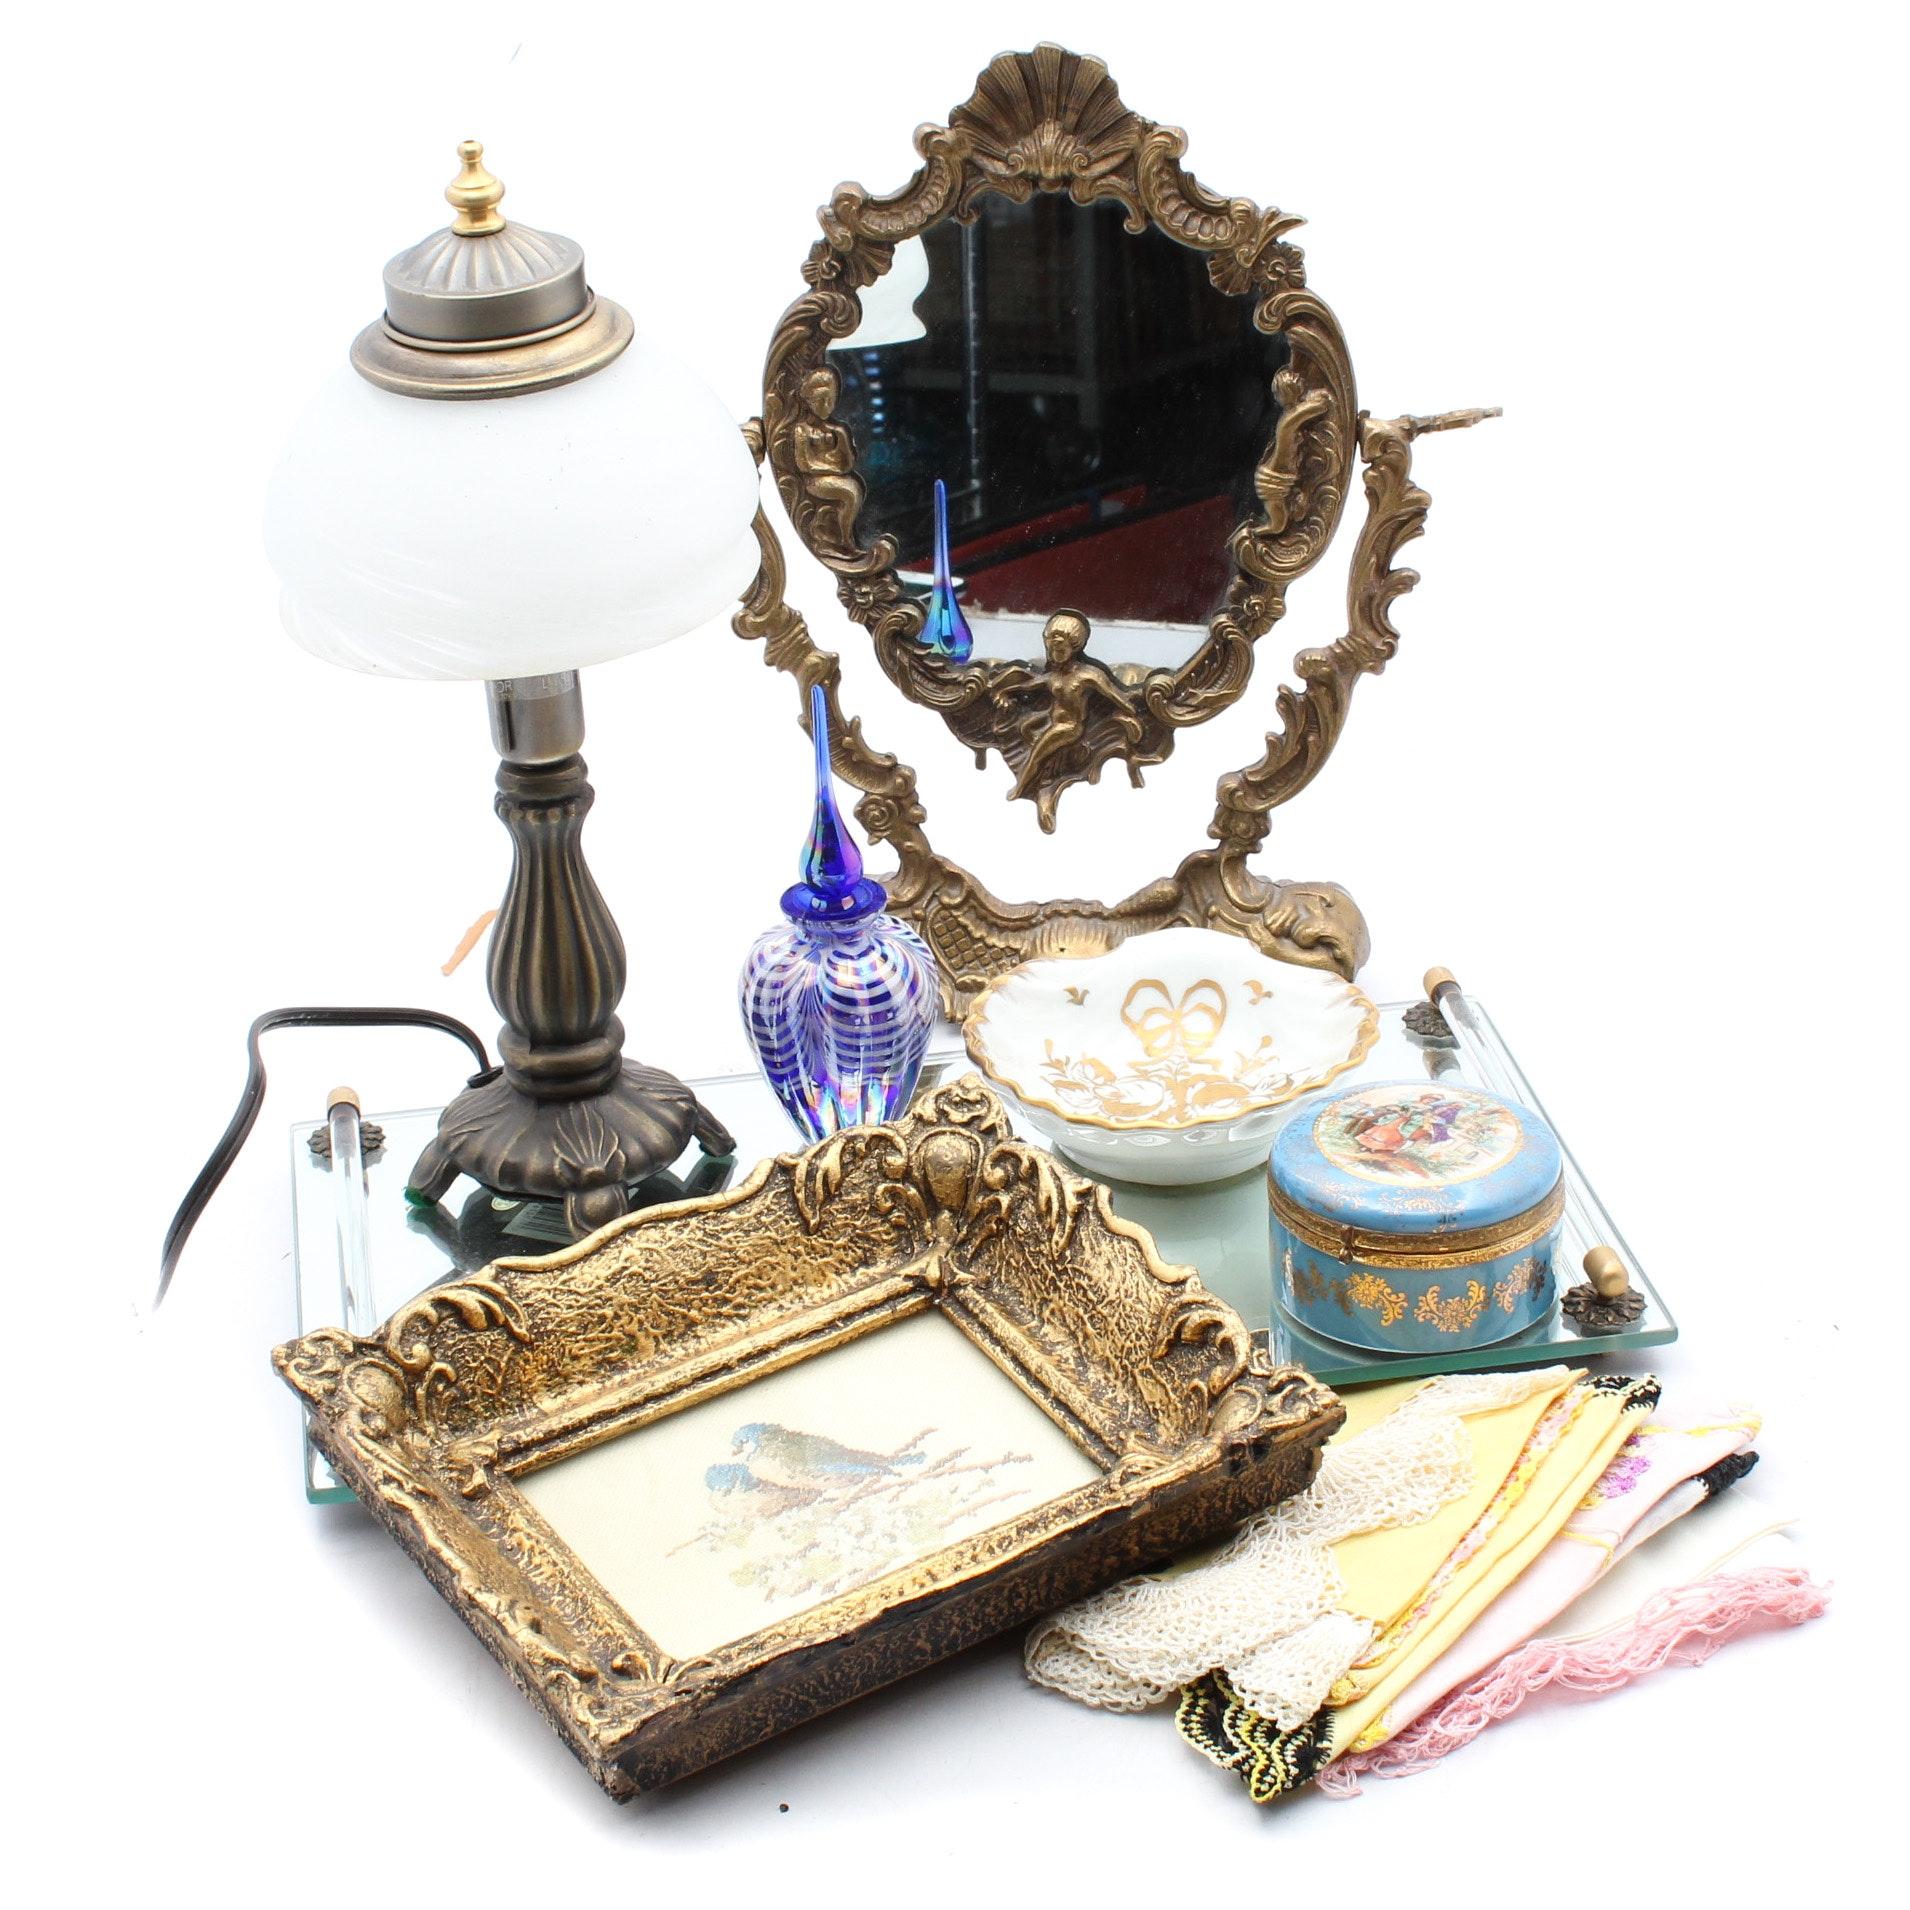 Vintage Vanity Decor